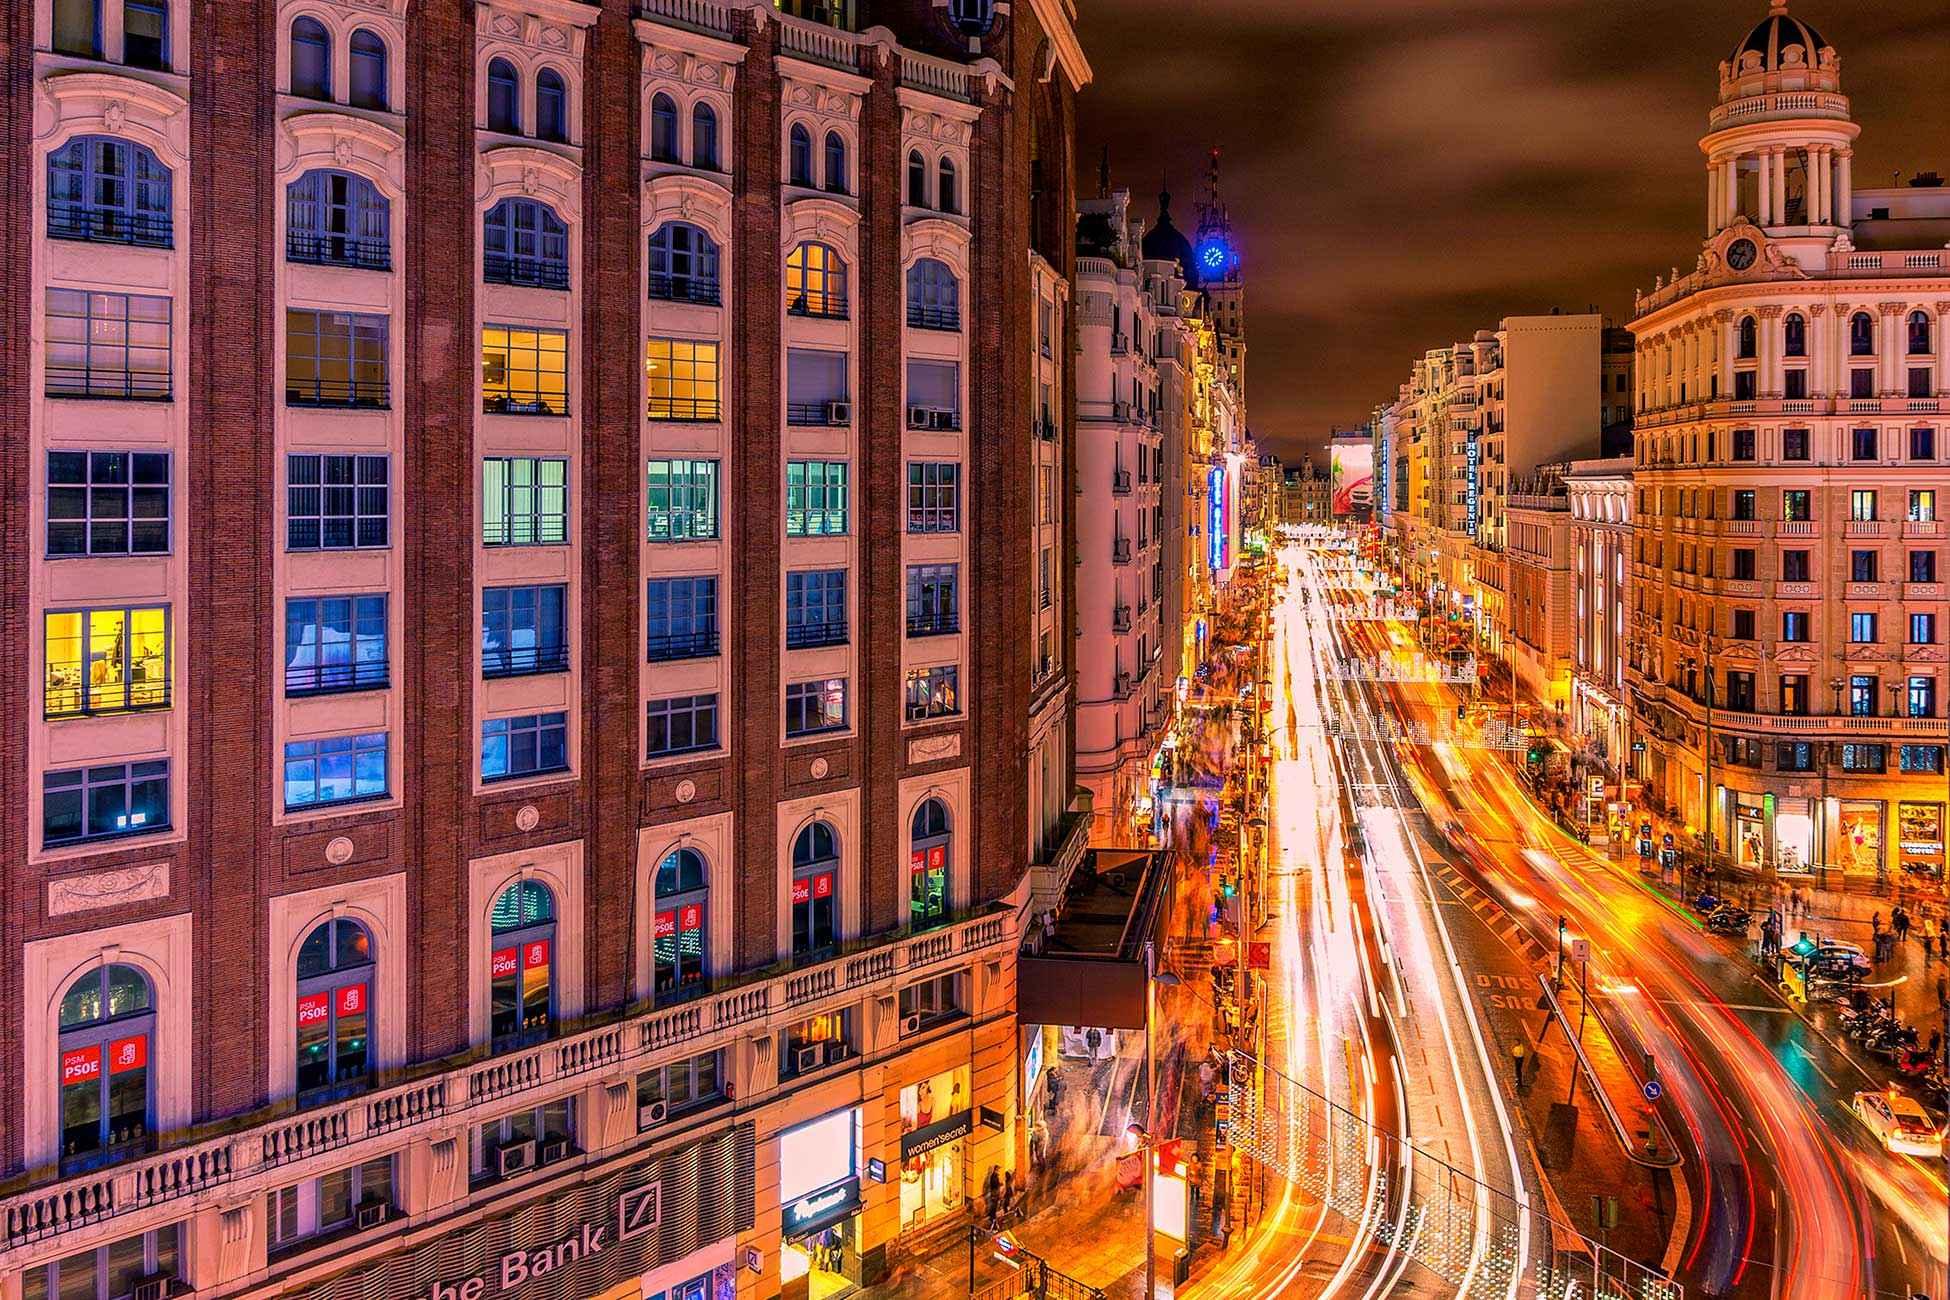 Nachtfotografie in Madrid